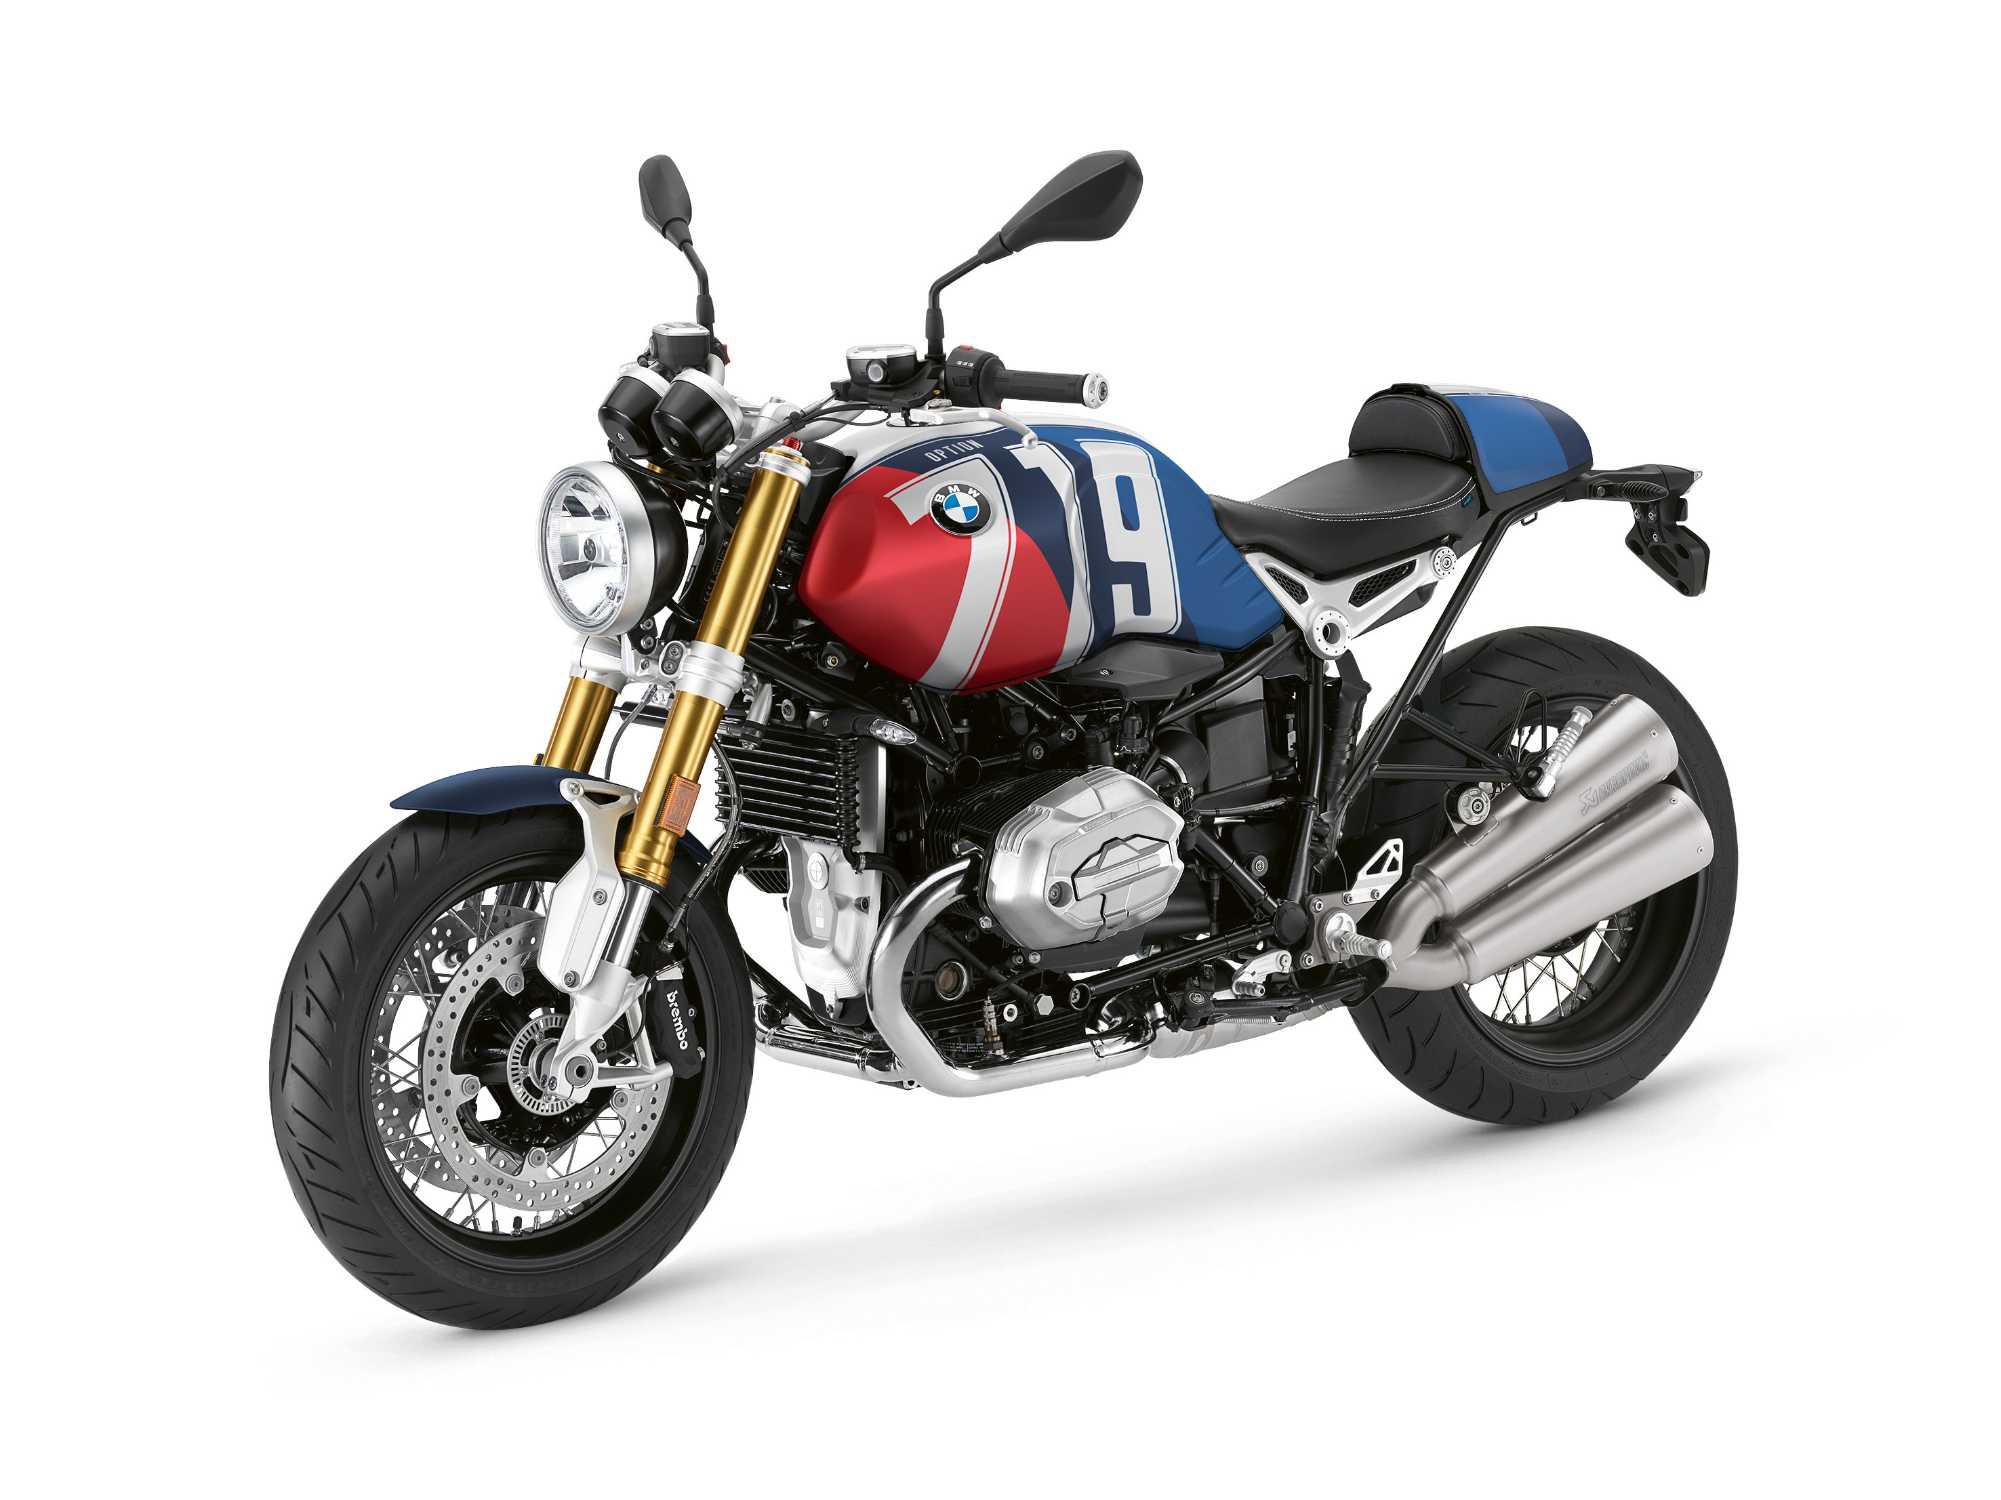 Bmw Motorrad Model Revision Measures For Model Year 2019